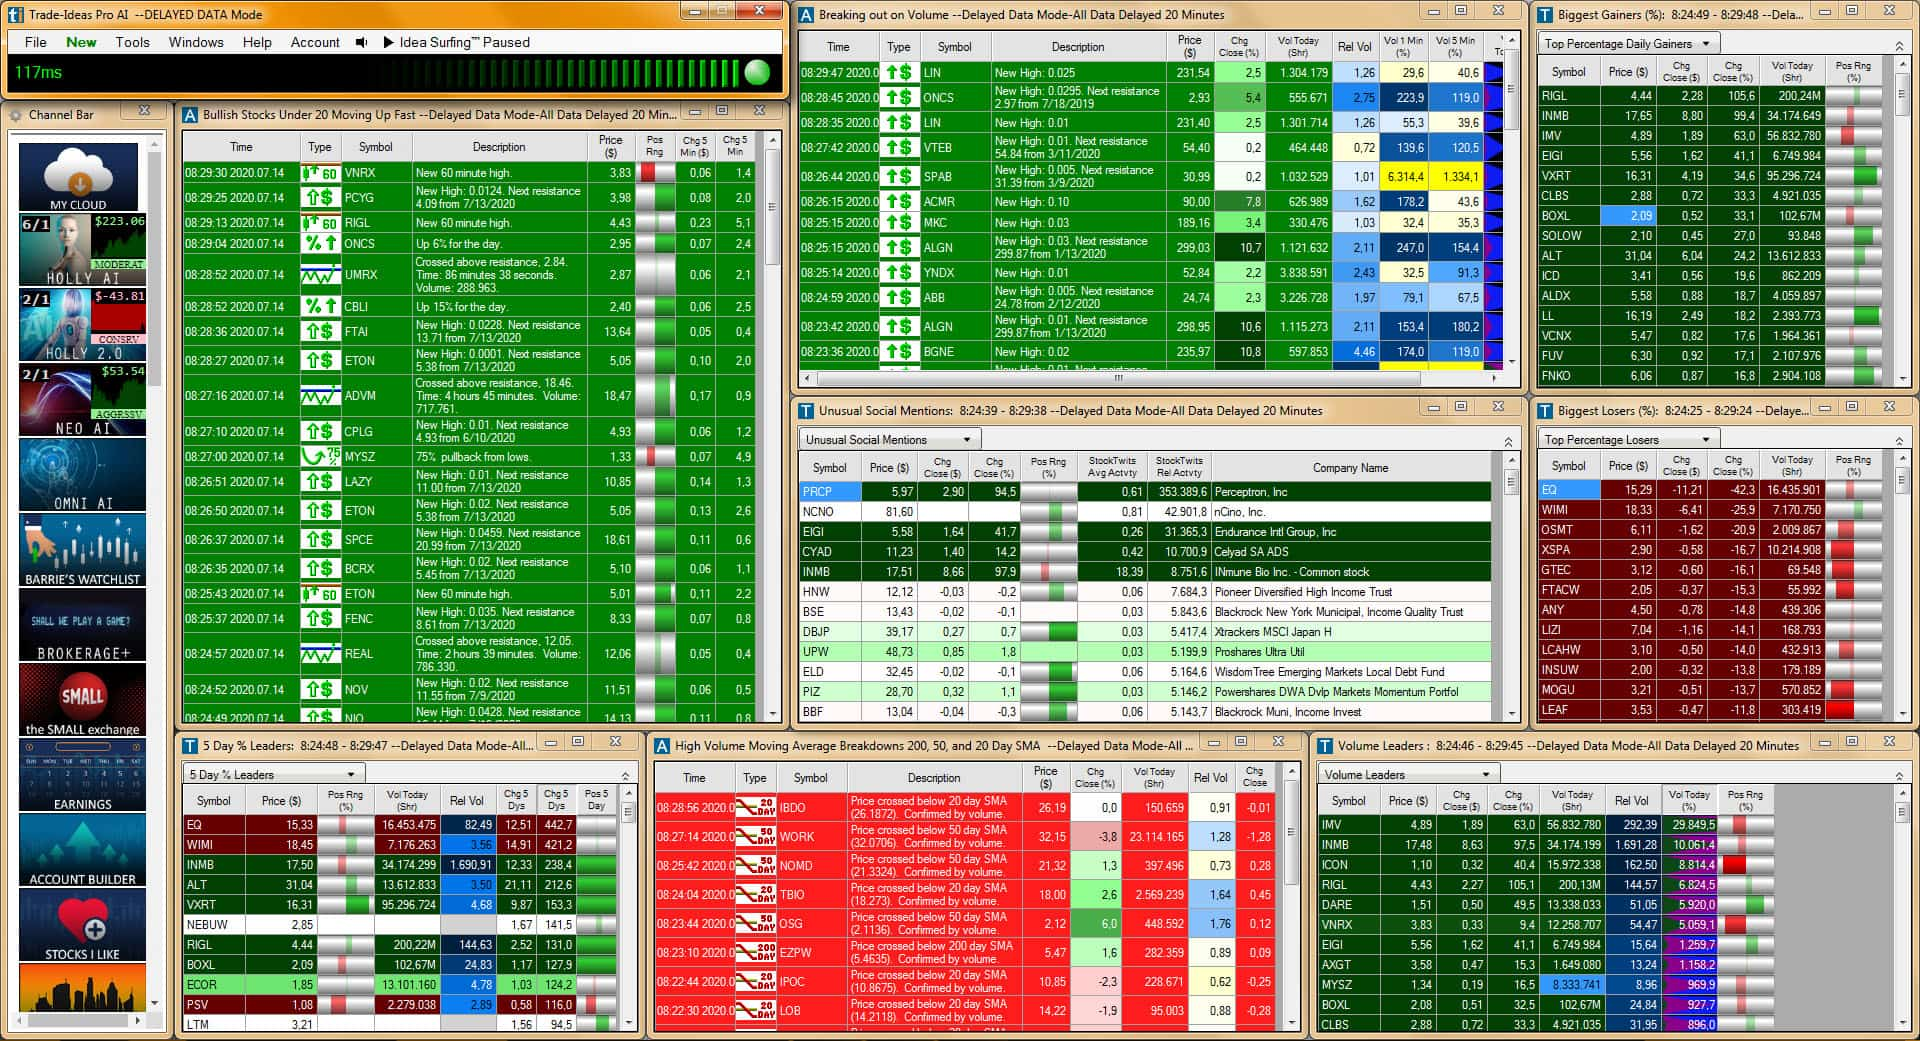 Screenshot of Trade Ideas stock scanner